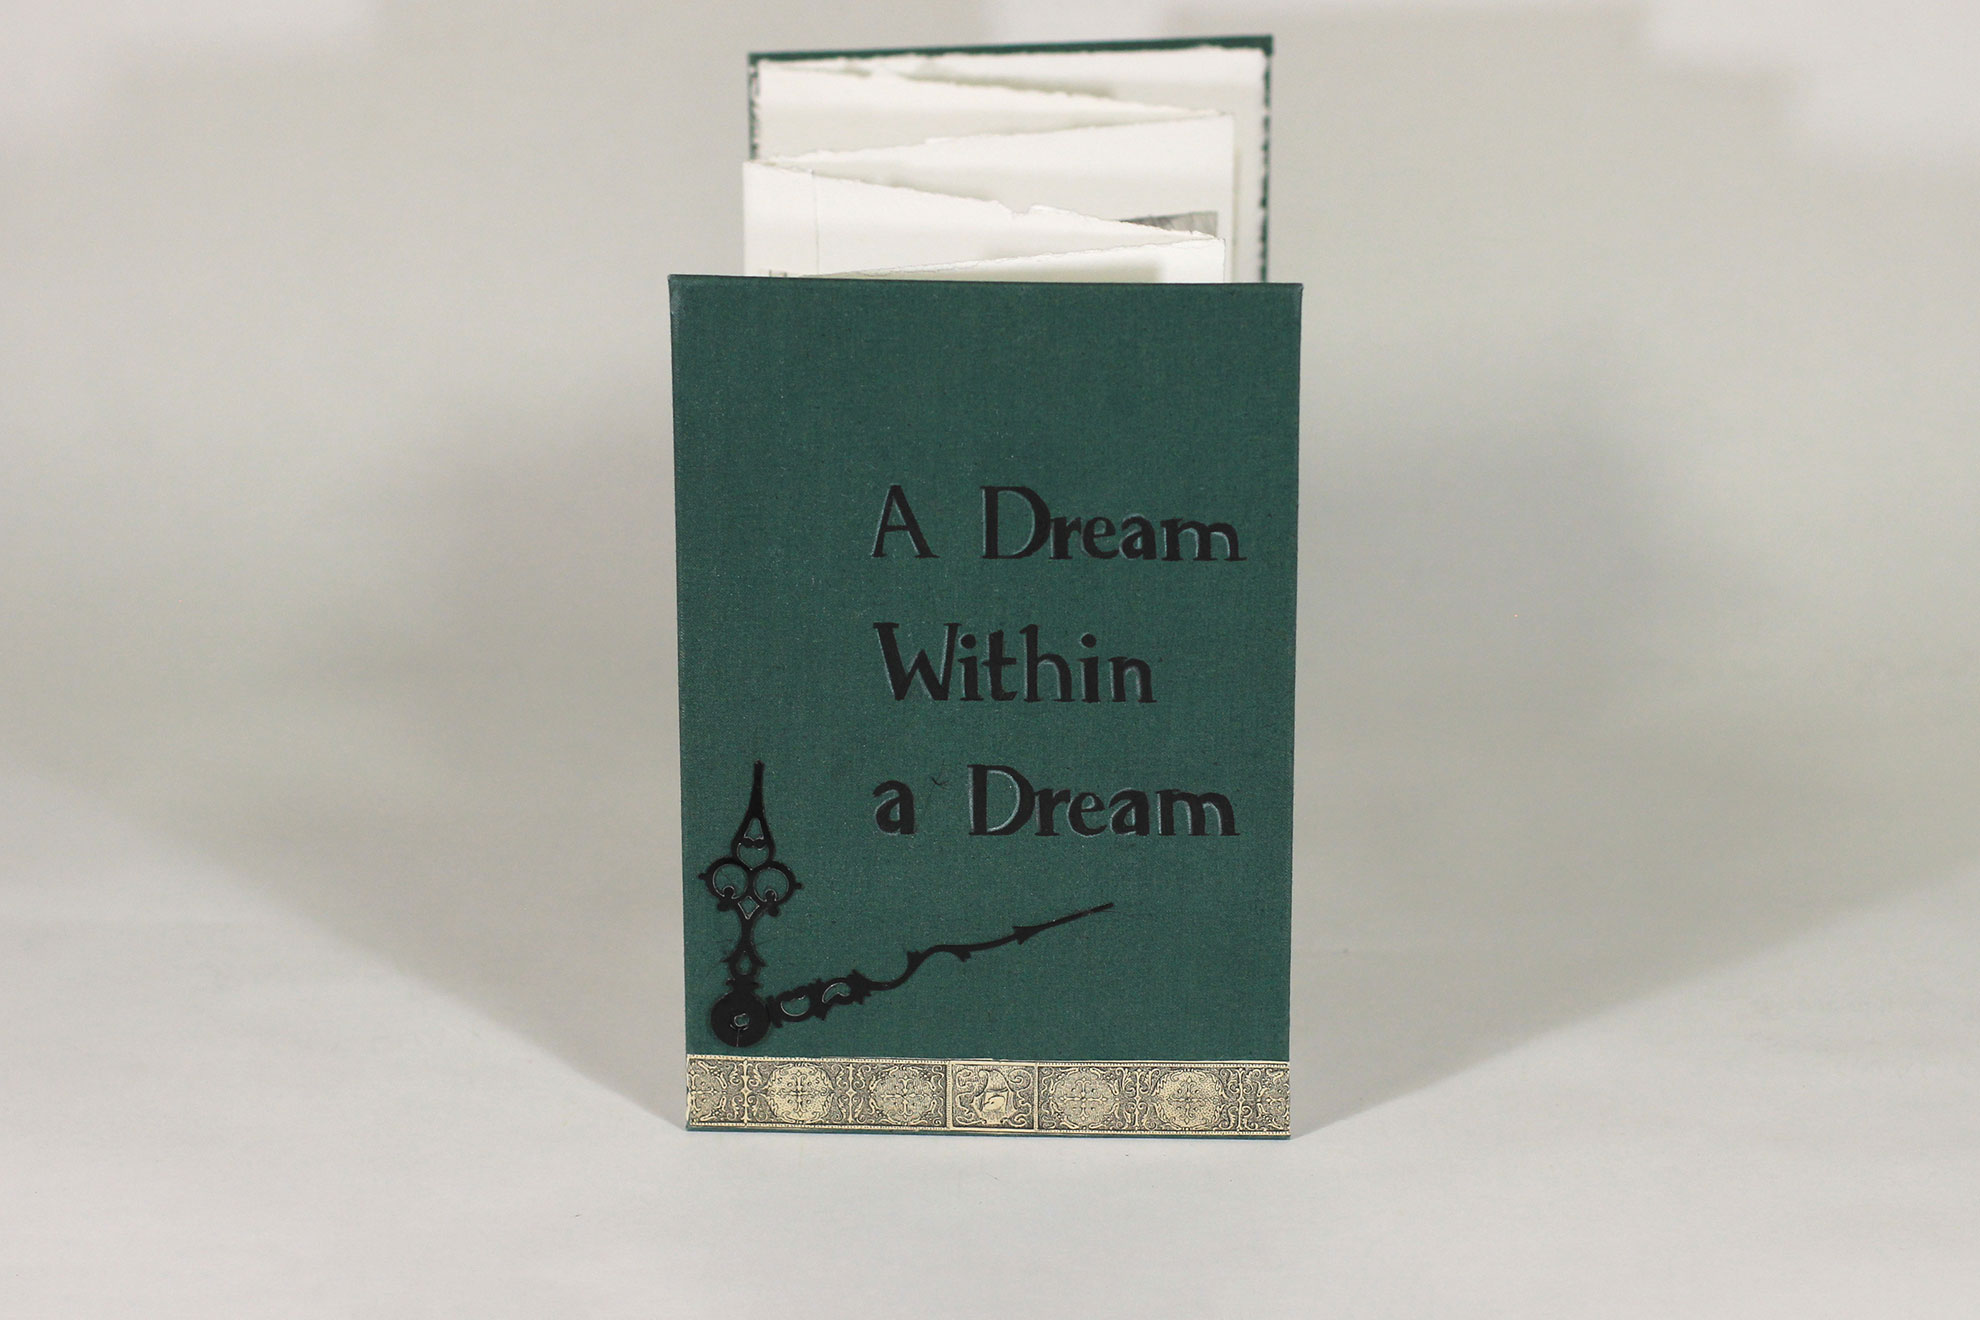 Megan Forster, A Dream Within a Dream, Mixed Media, 2018, NFS, Kalamazoo, MI